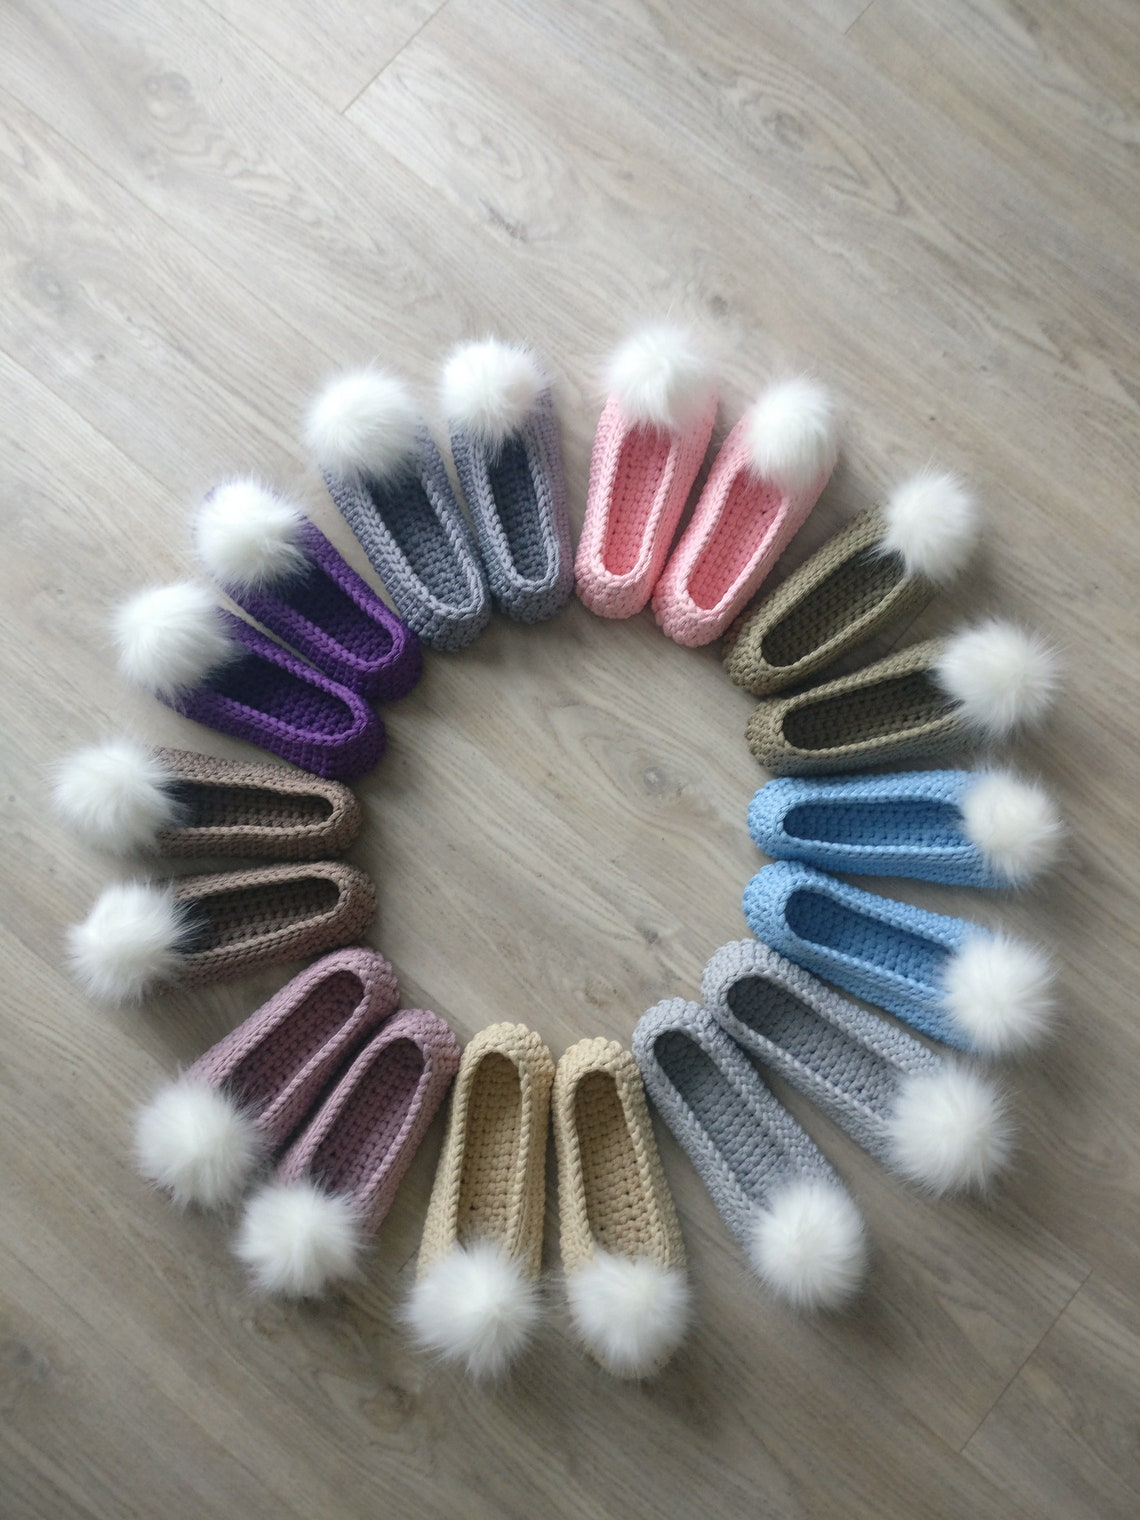 Biscuit Crochet Non-slip Indoor Slippers For Woman Rope - Big Sale T6BfS